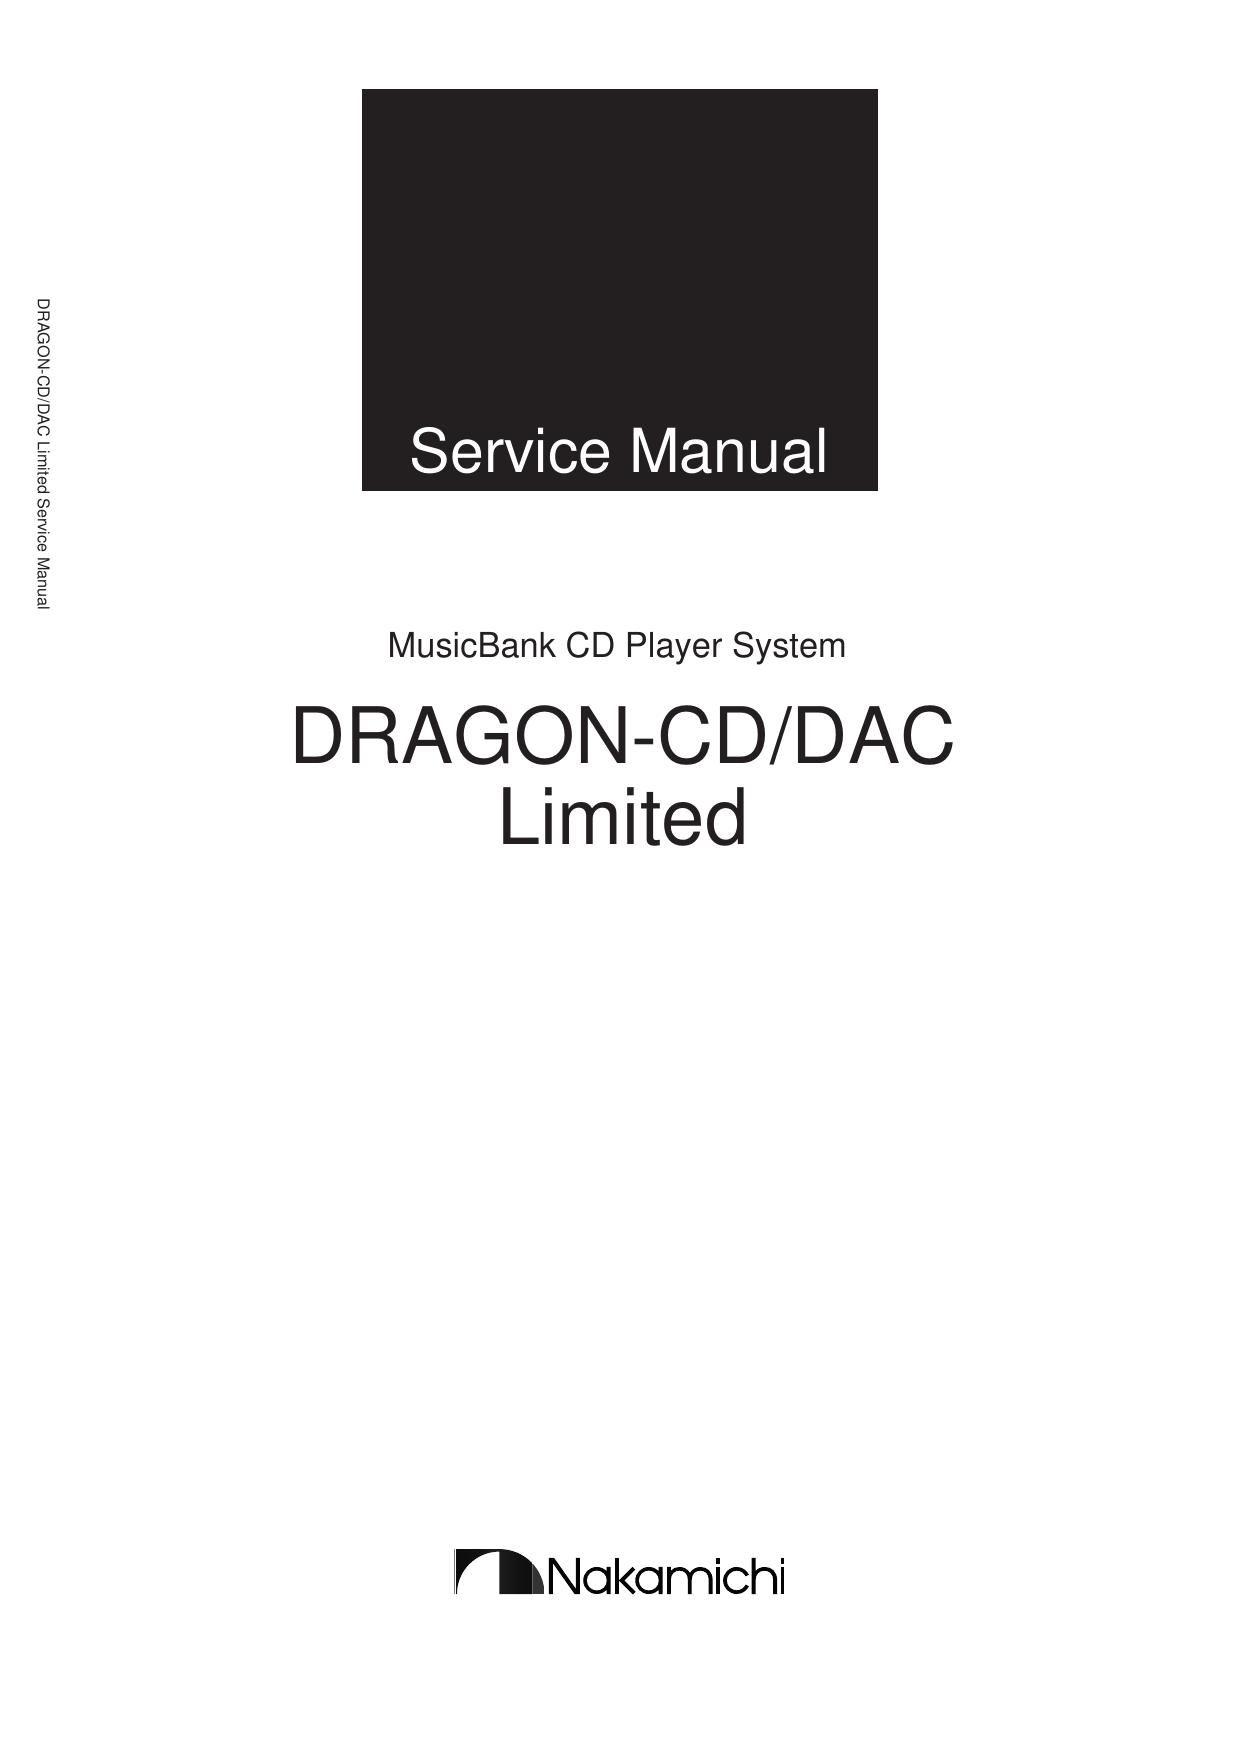 nakamichi dragon cd limited service manual rh audioservicemanuals com nakamichi dragon cassette deck service manual nakamichi dragon owners manual